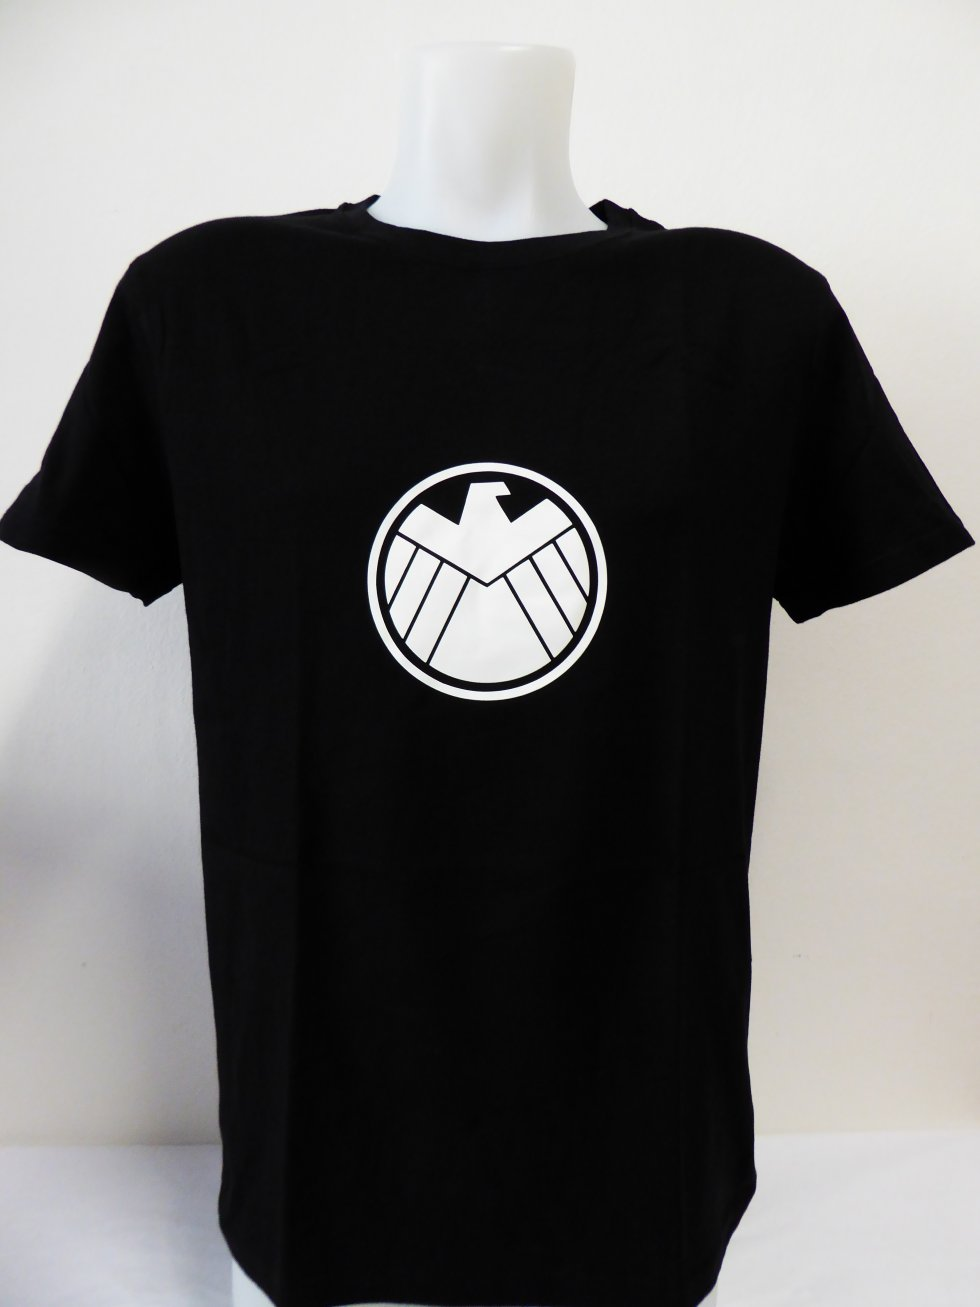 Design t shirt glow in the dark - Glow In The Dark T Shirt Captain America